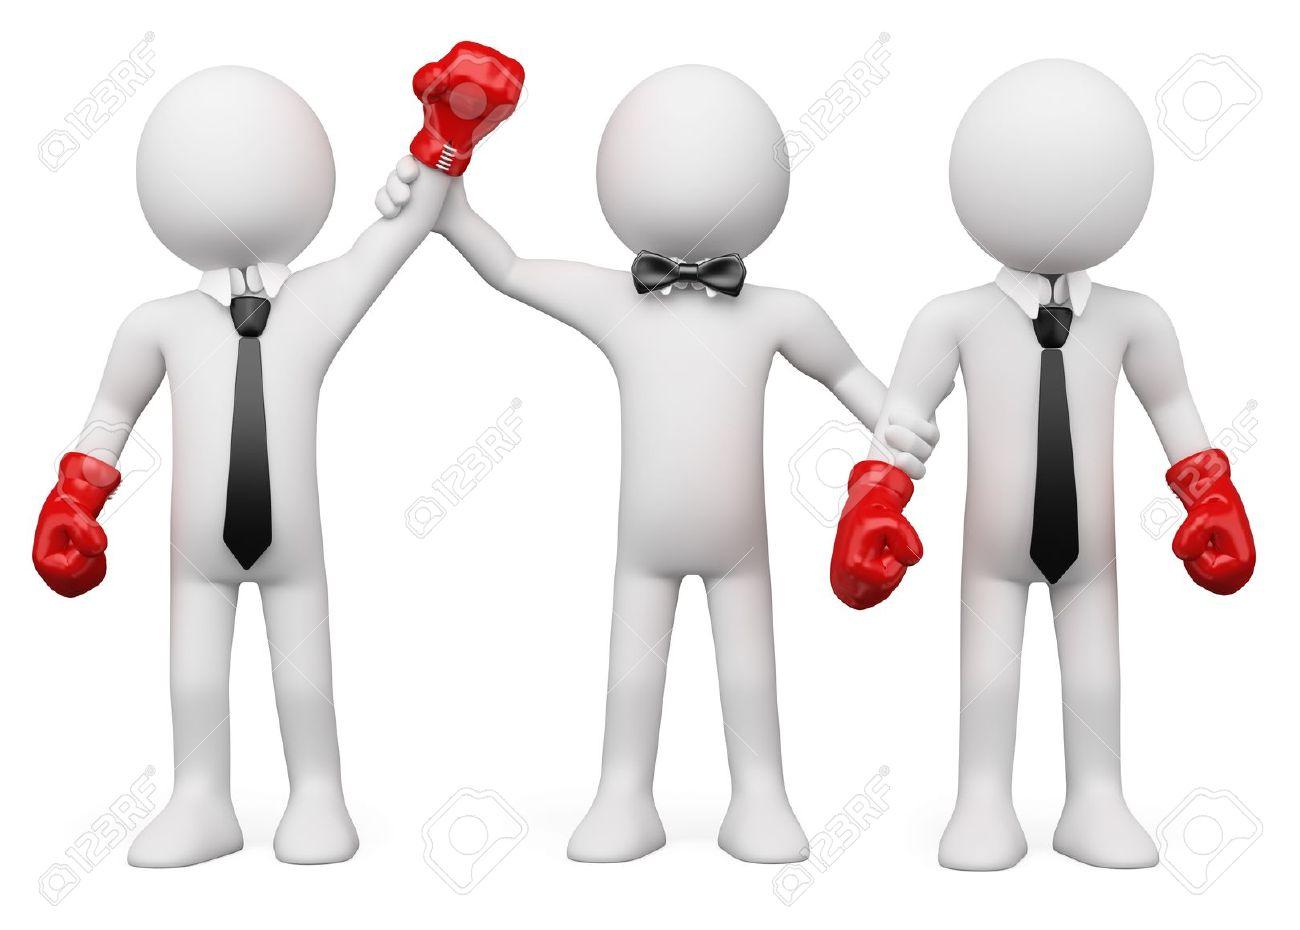 Boxing Referee choosing the winner between two businessmen - 11559802